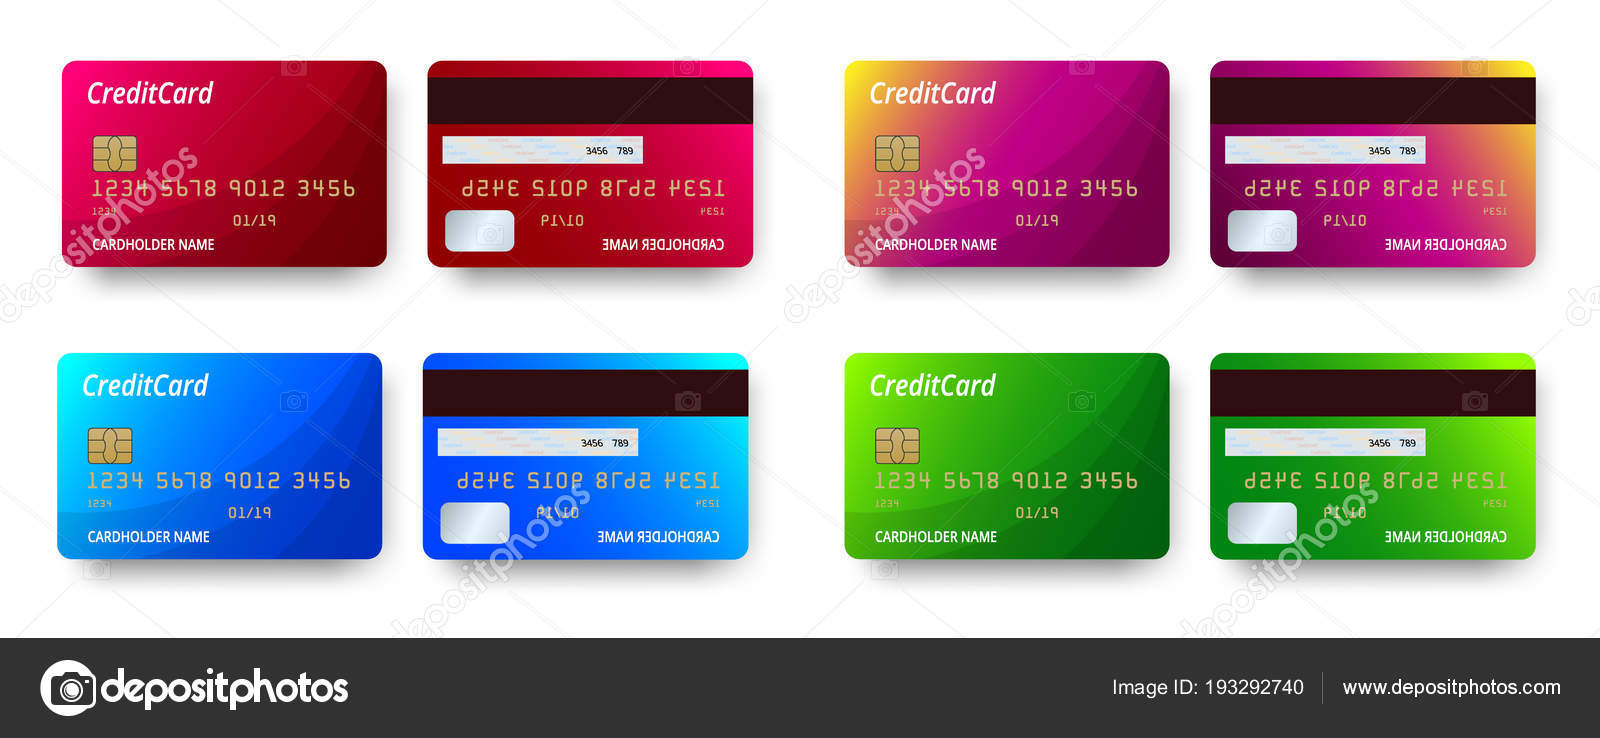 templates realistic detailed credit cards set design vector plastic credit card or debit card - Plastic Credit Card